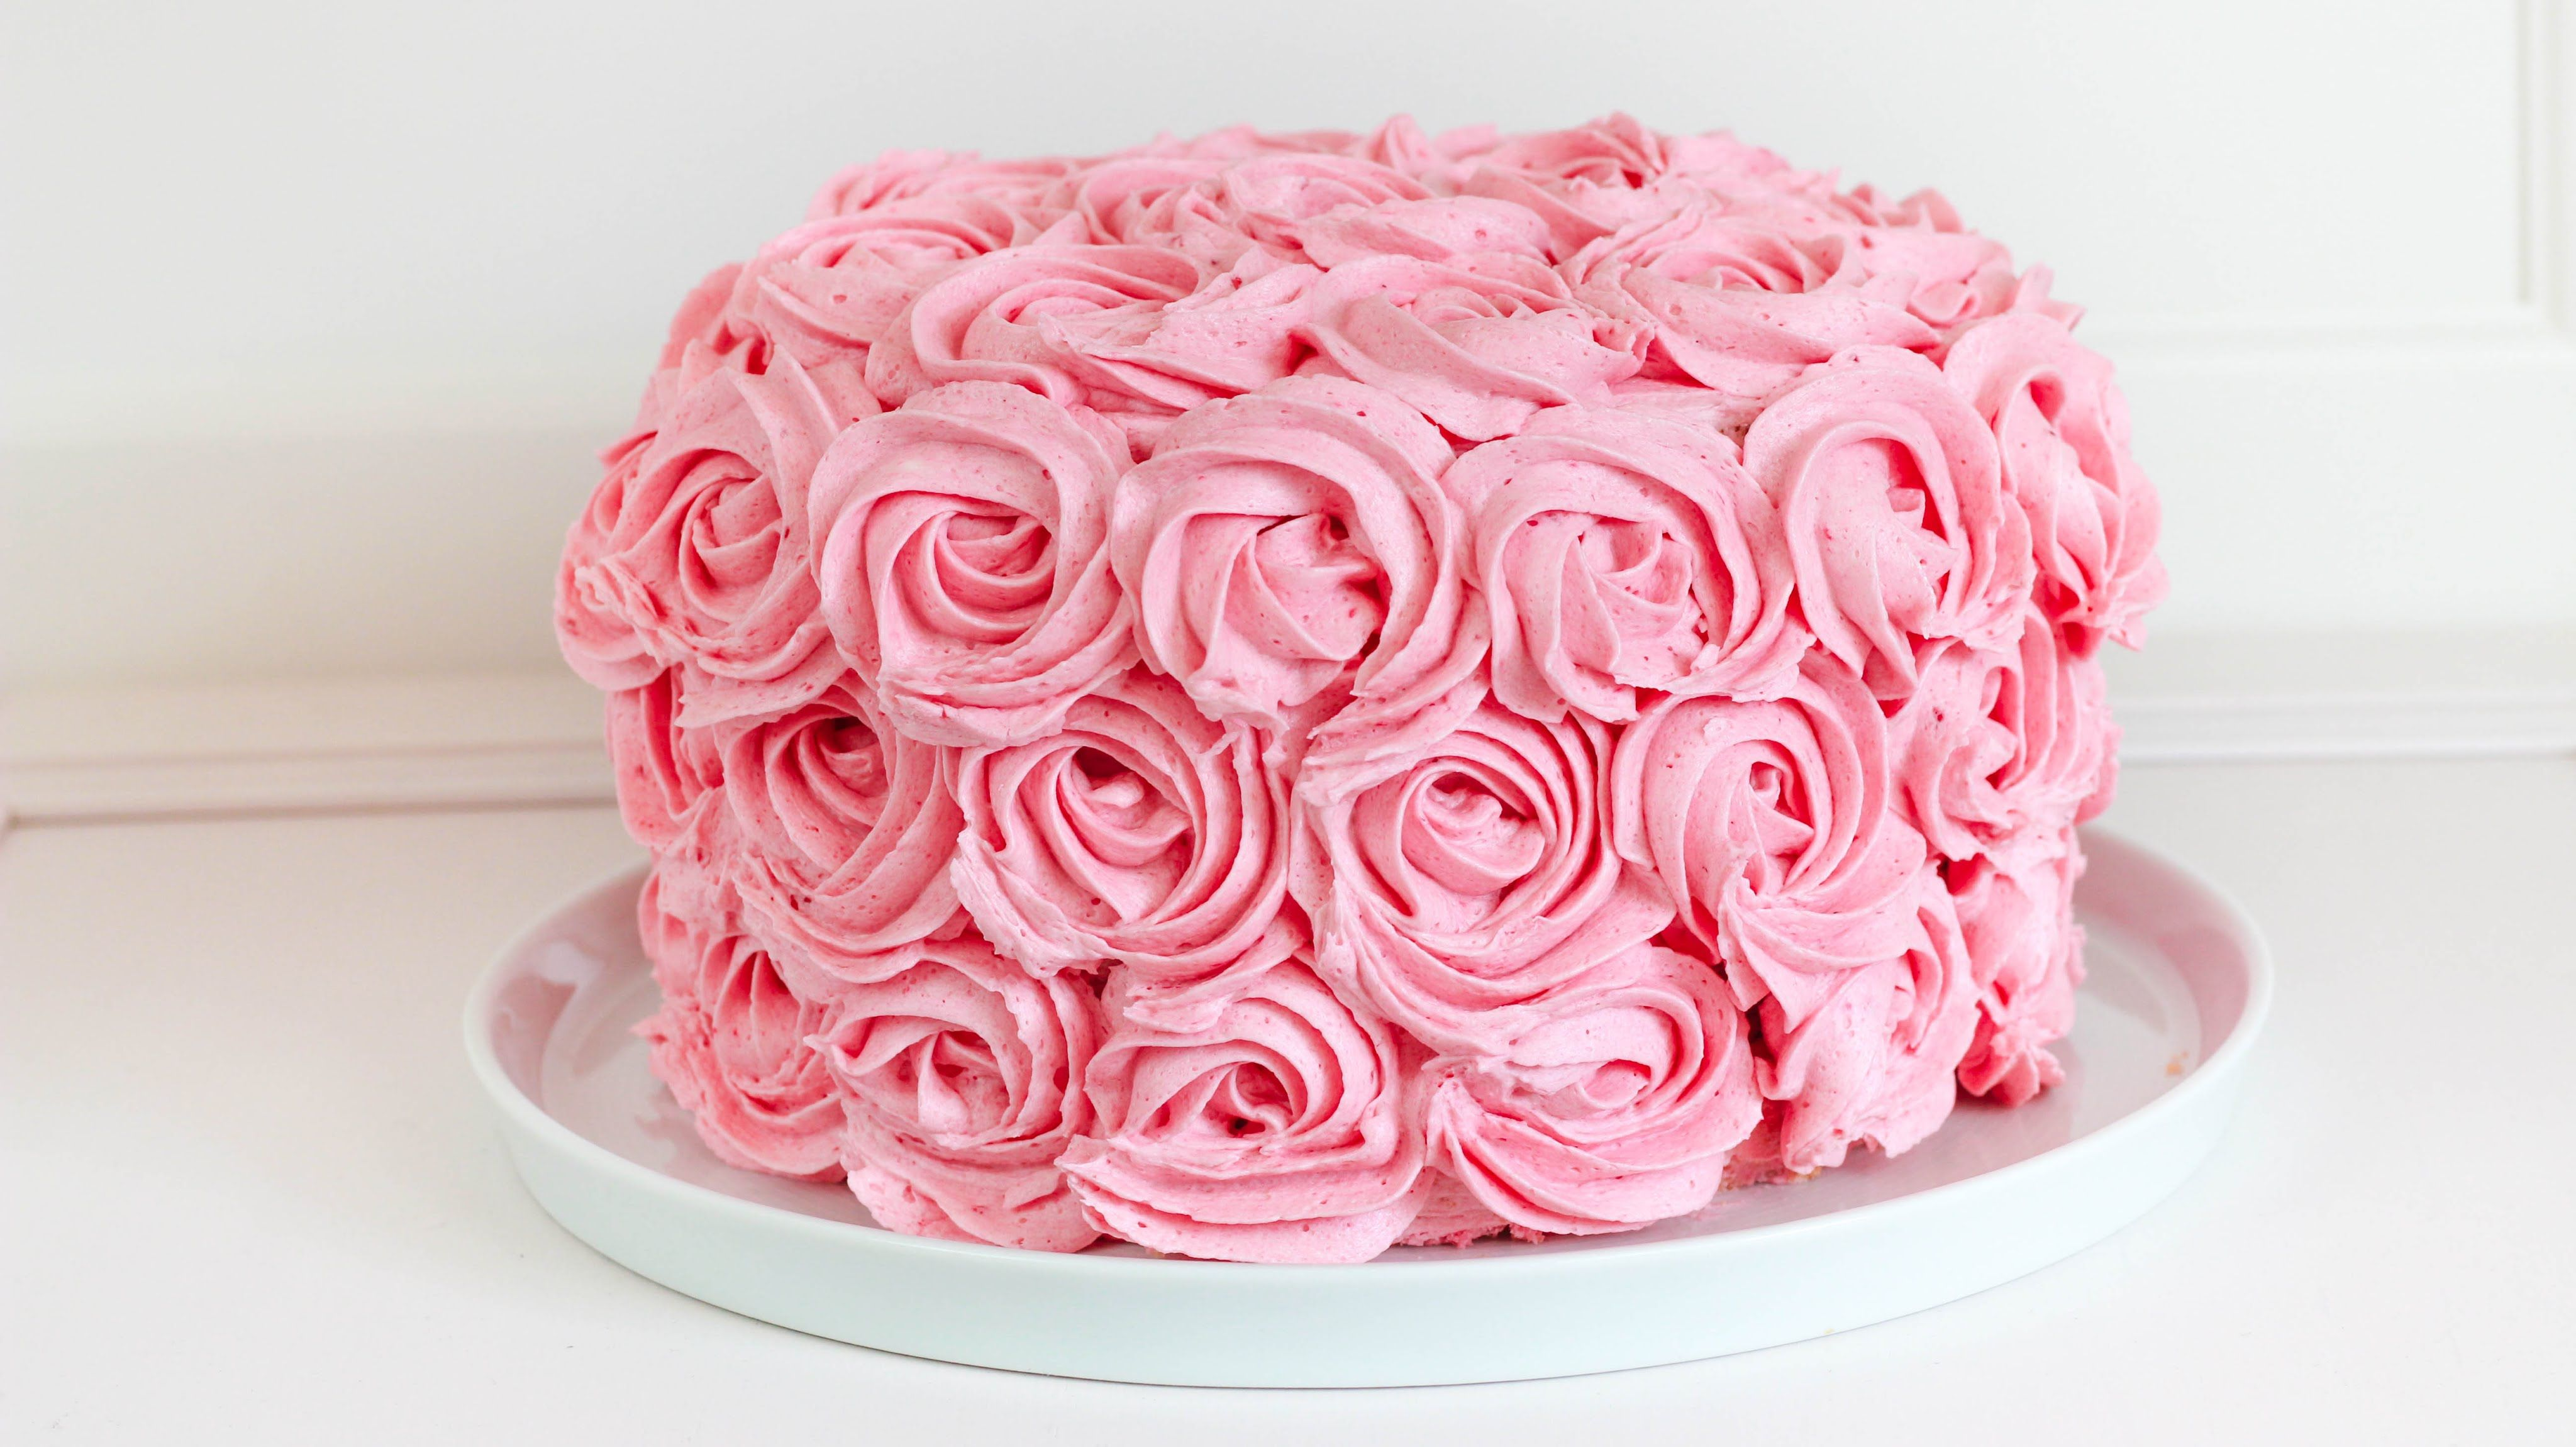 rosentorte mit erdbeeren und himbeeren buttercreme rosen torte rezept youtube motivtorten. Black Bedroom Furniture Sets. Home Design Ideas